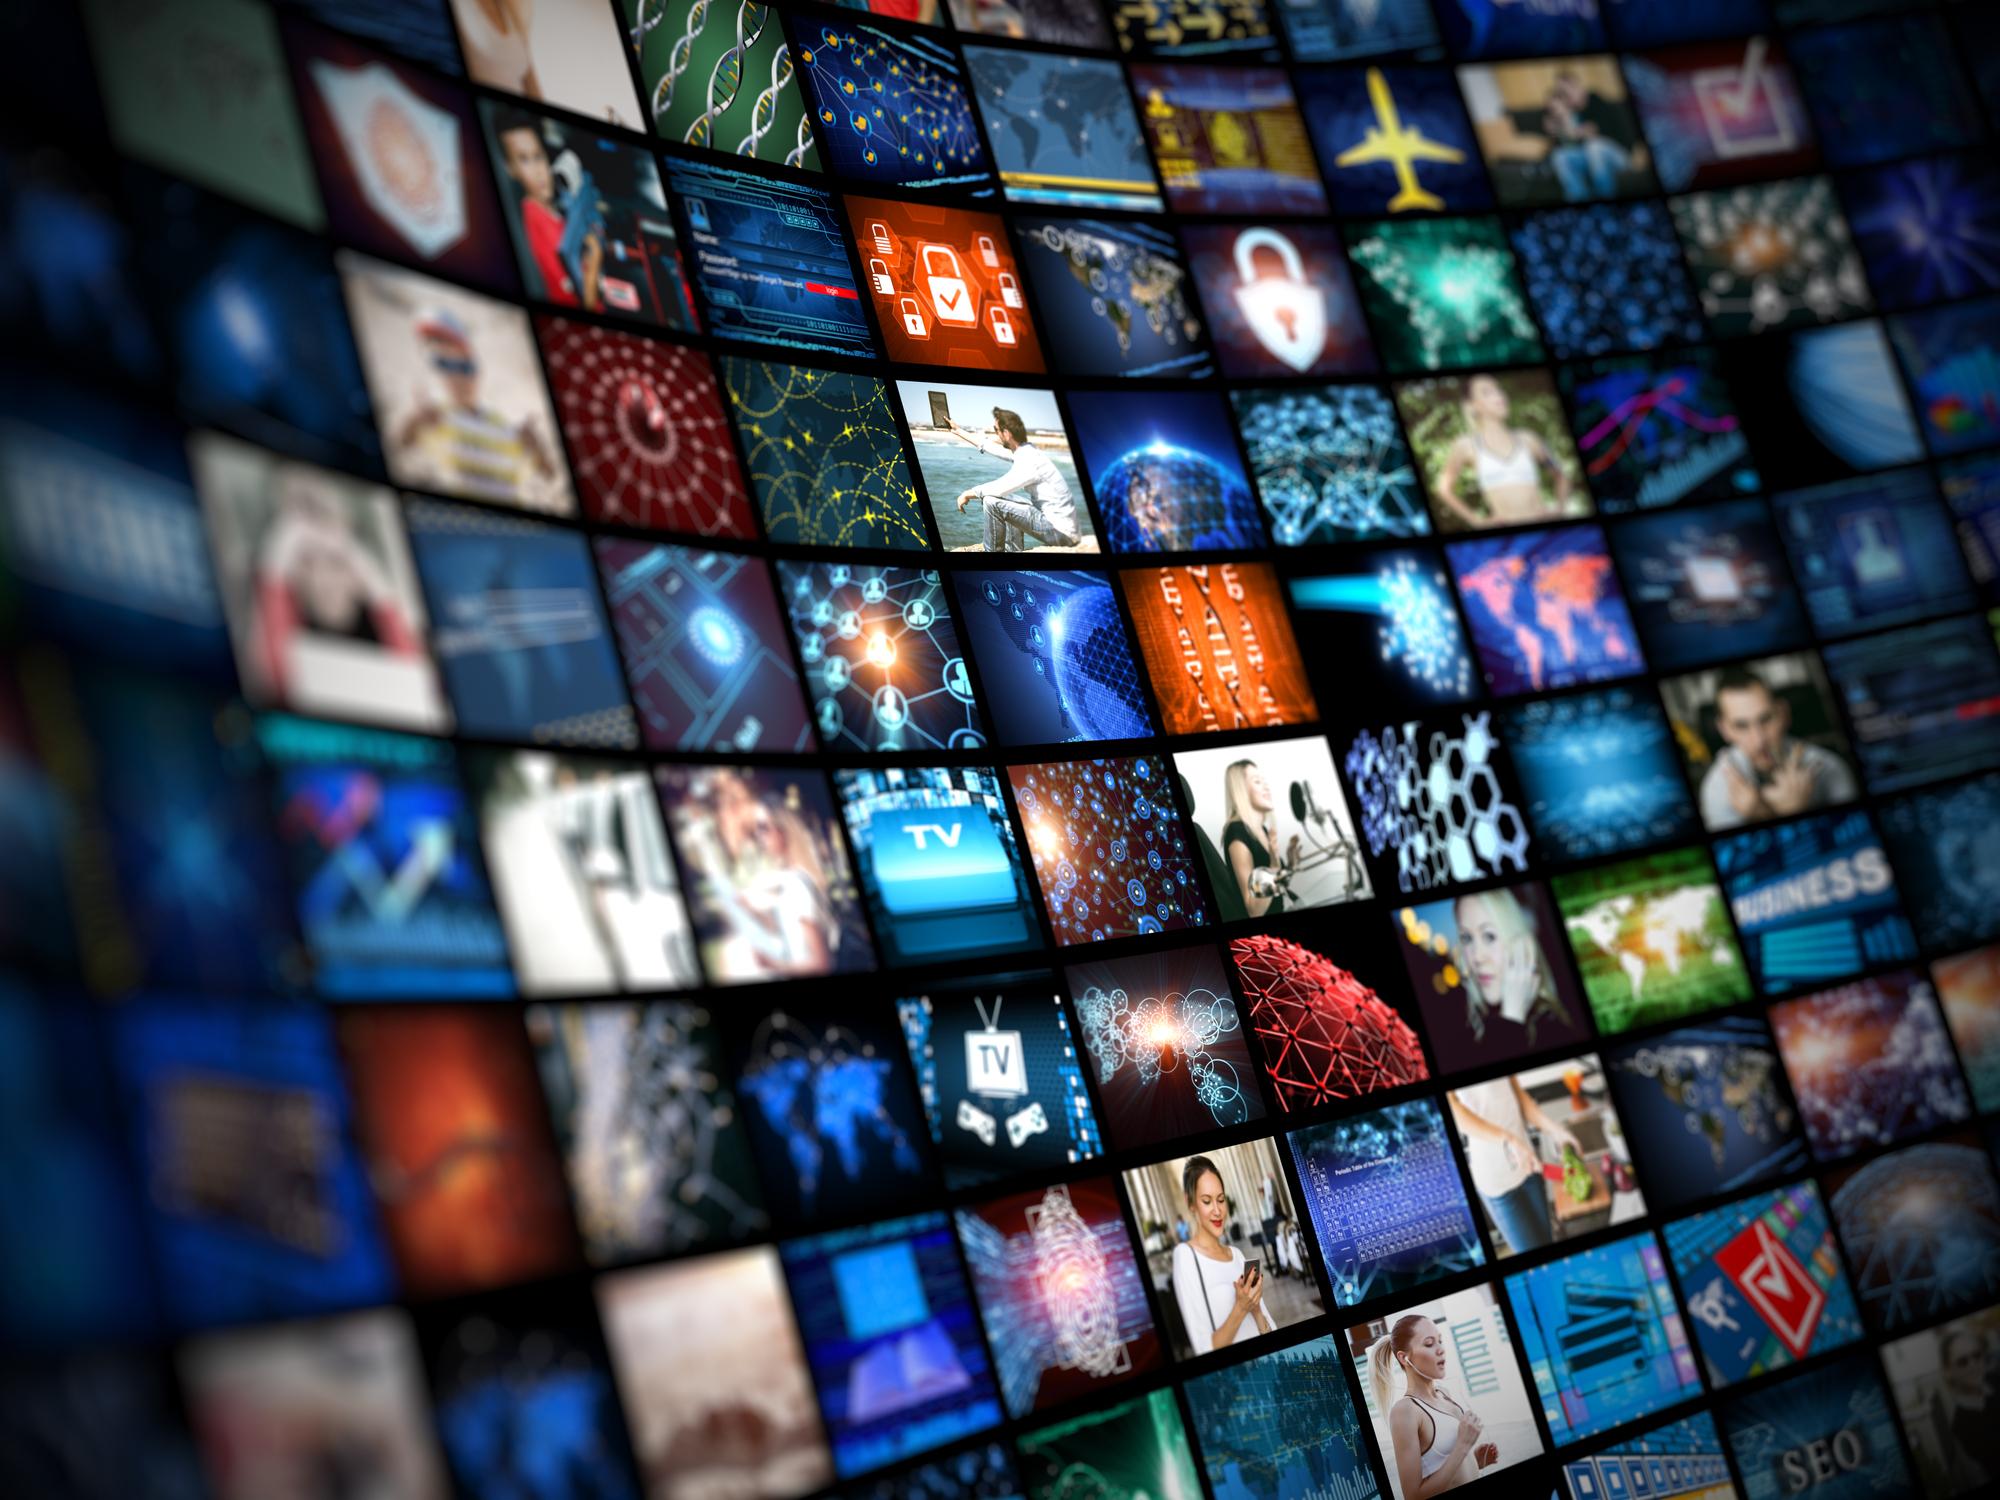 Image: iStock - Media concept smart TV